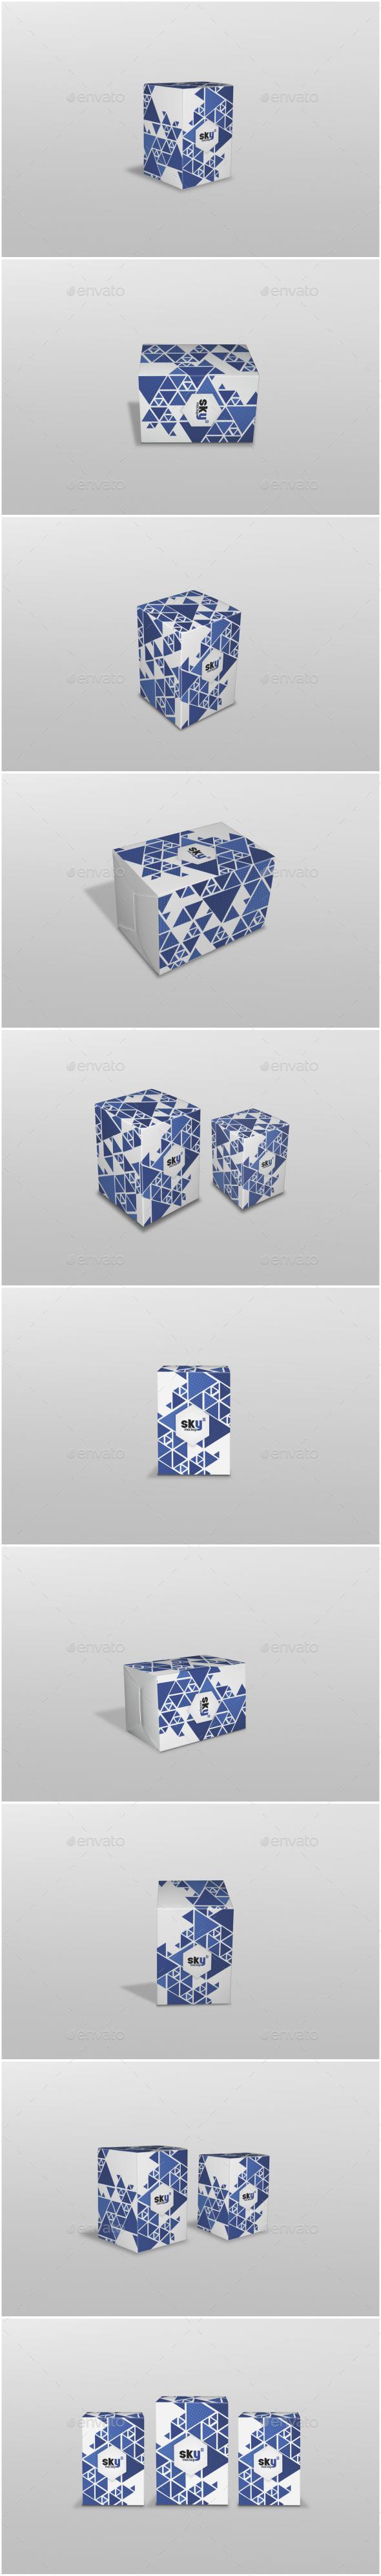 GraphicRiver Box Mockup 20569683